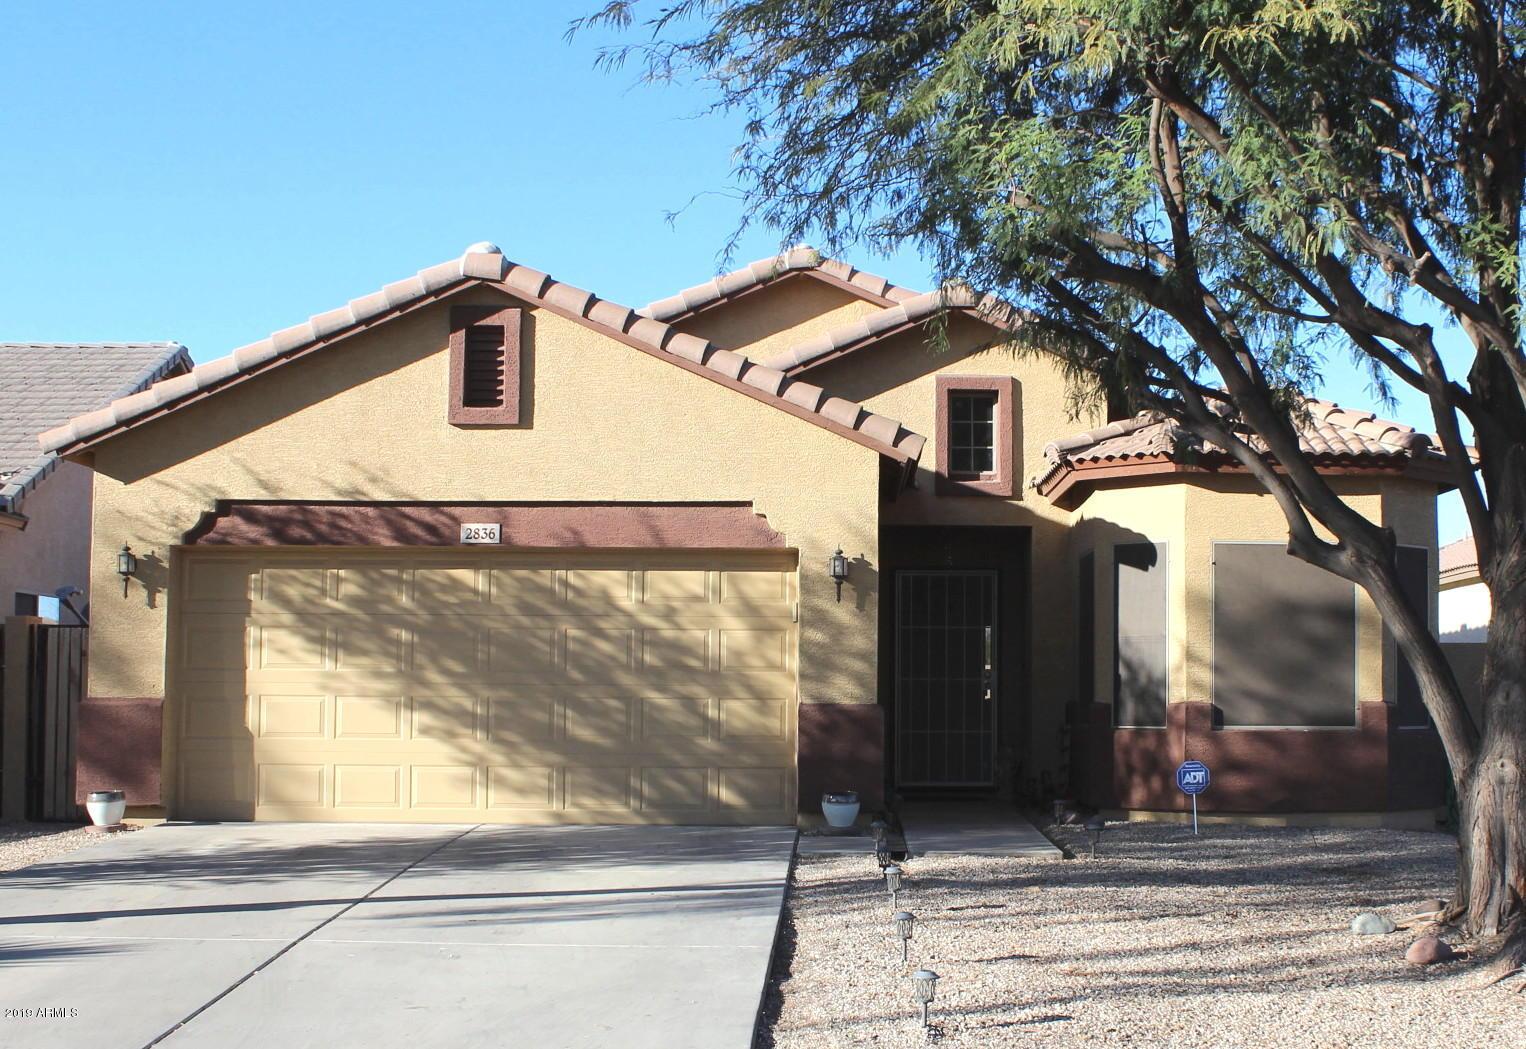 Photo of 2836 E MORENCI Road, San Tan Valley, AZ 85143